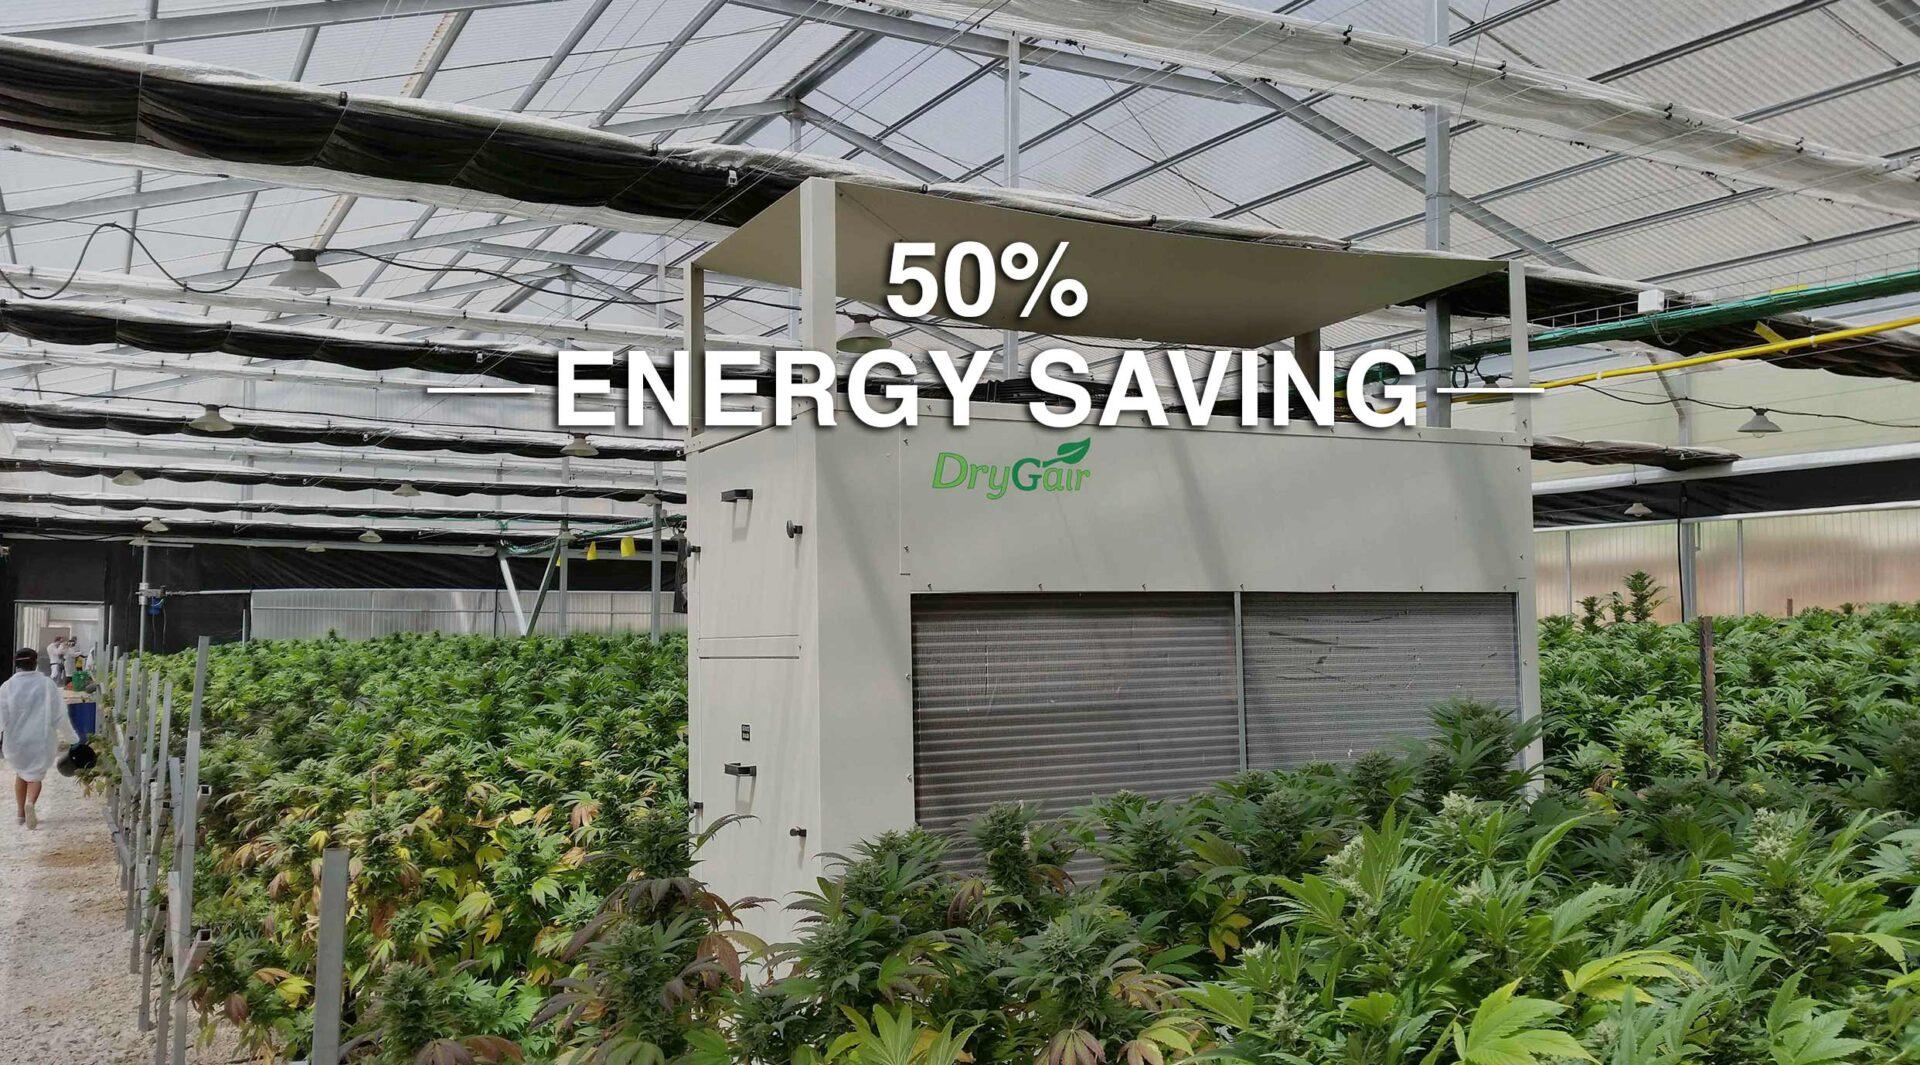 greenhouse dehumidifier 50% energy saving